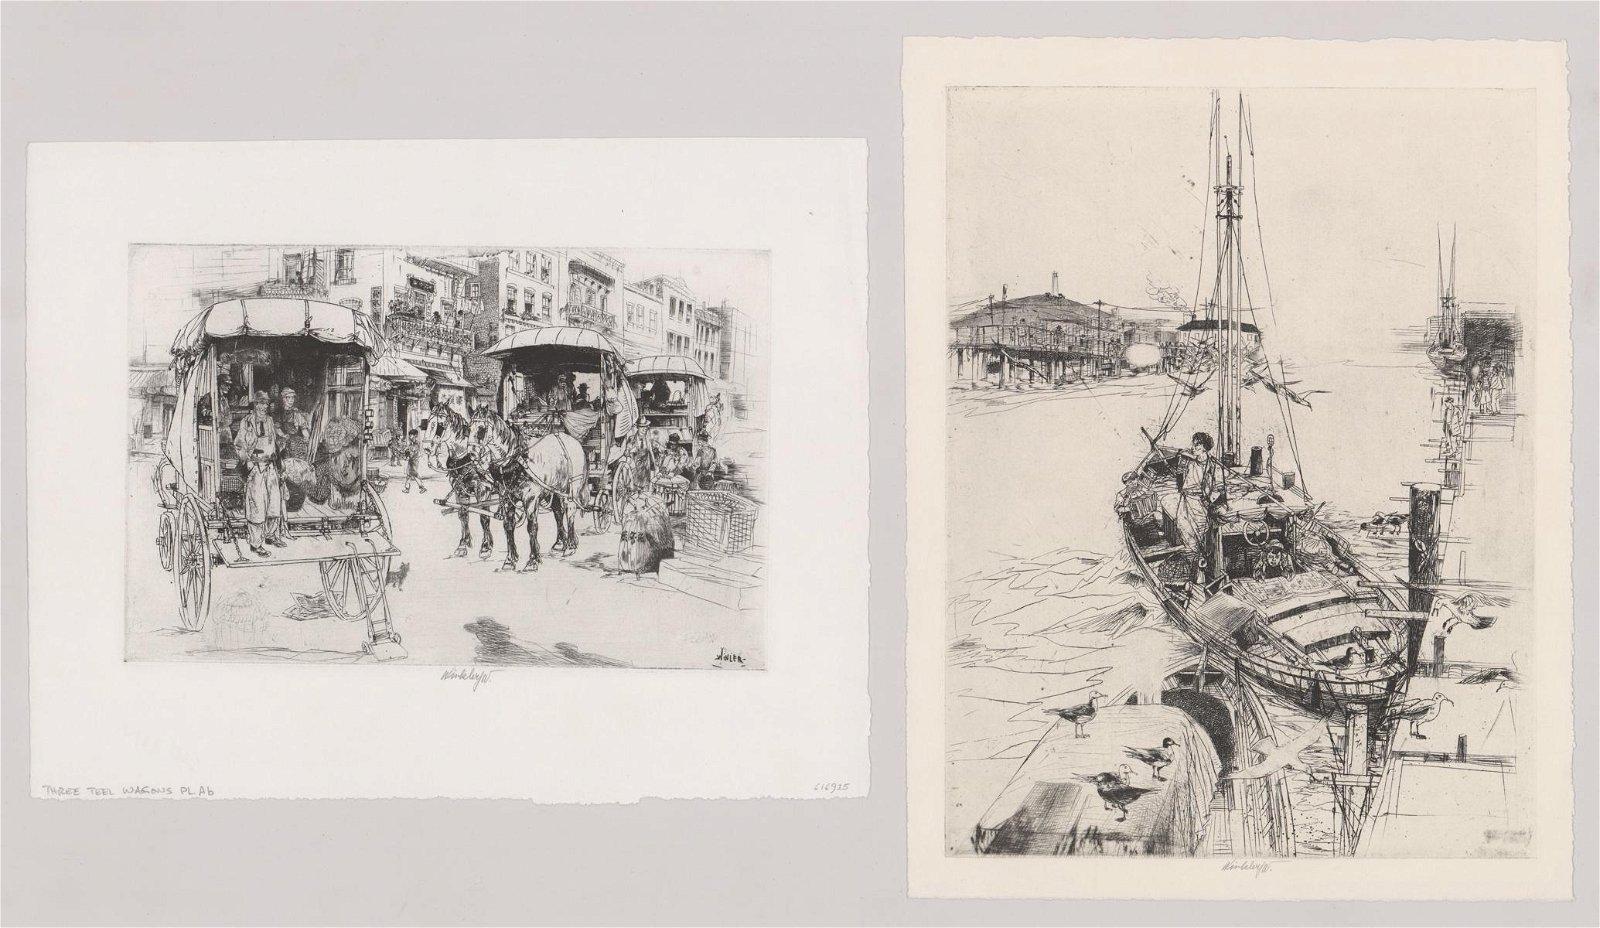 John Winkler Etchings [Boat, City Market]